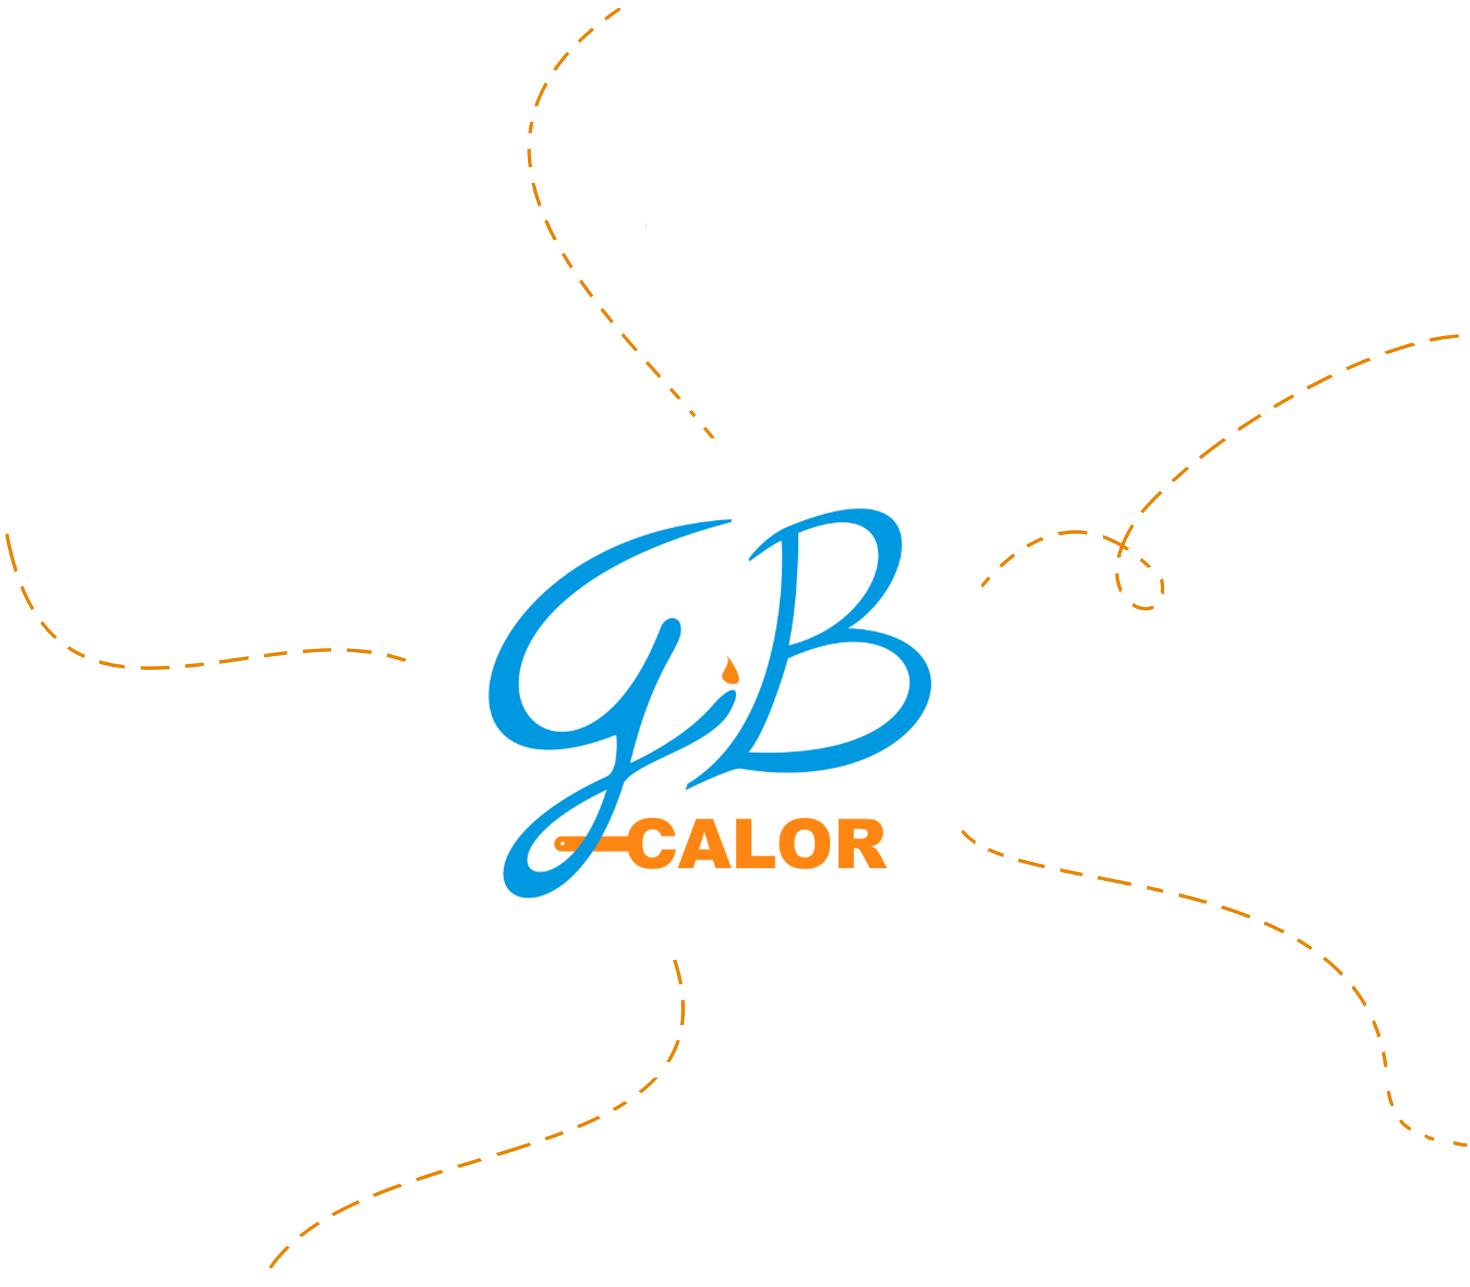 Gb Calor